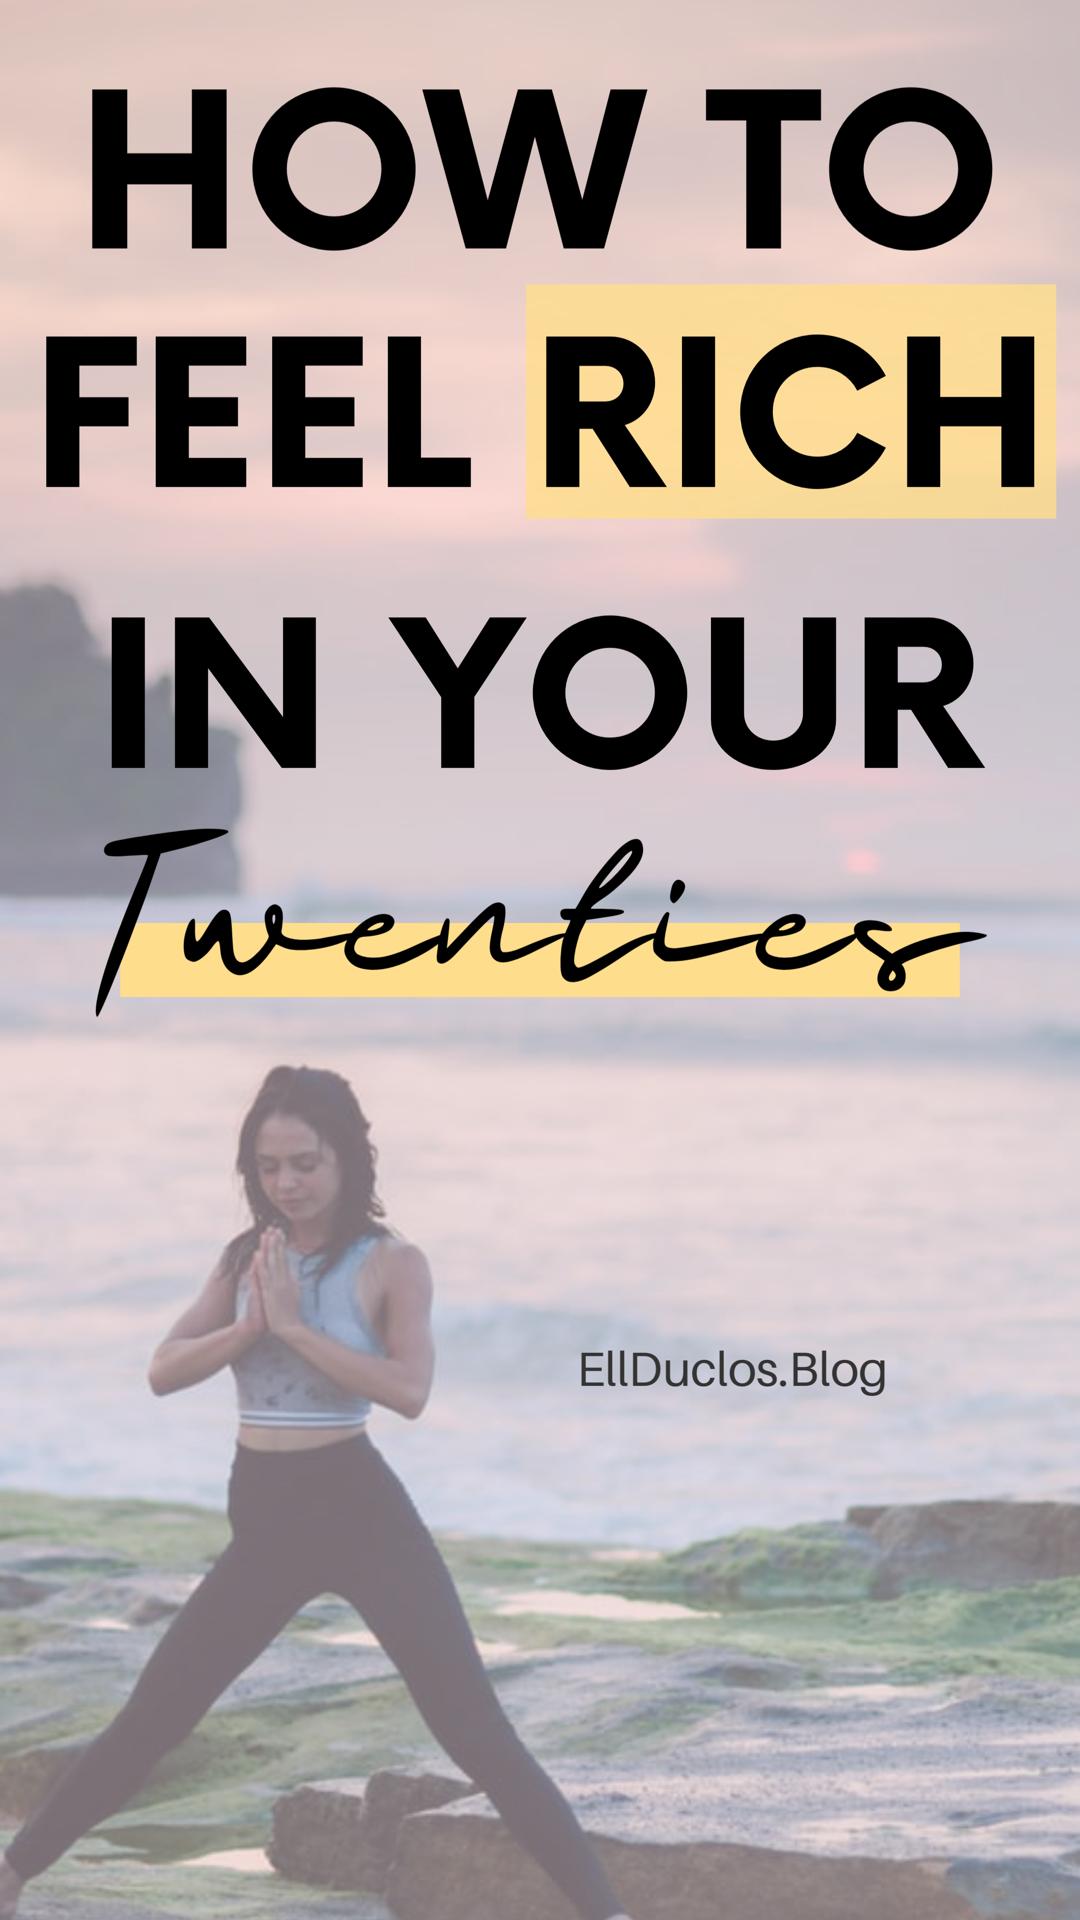 How To Feel Rich In Your Twenties